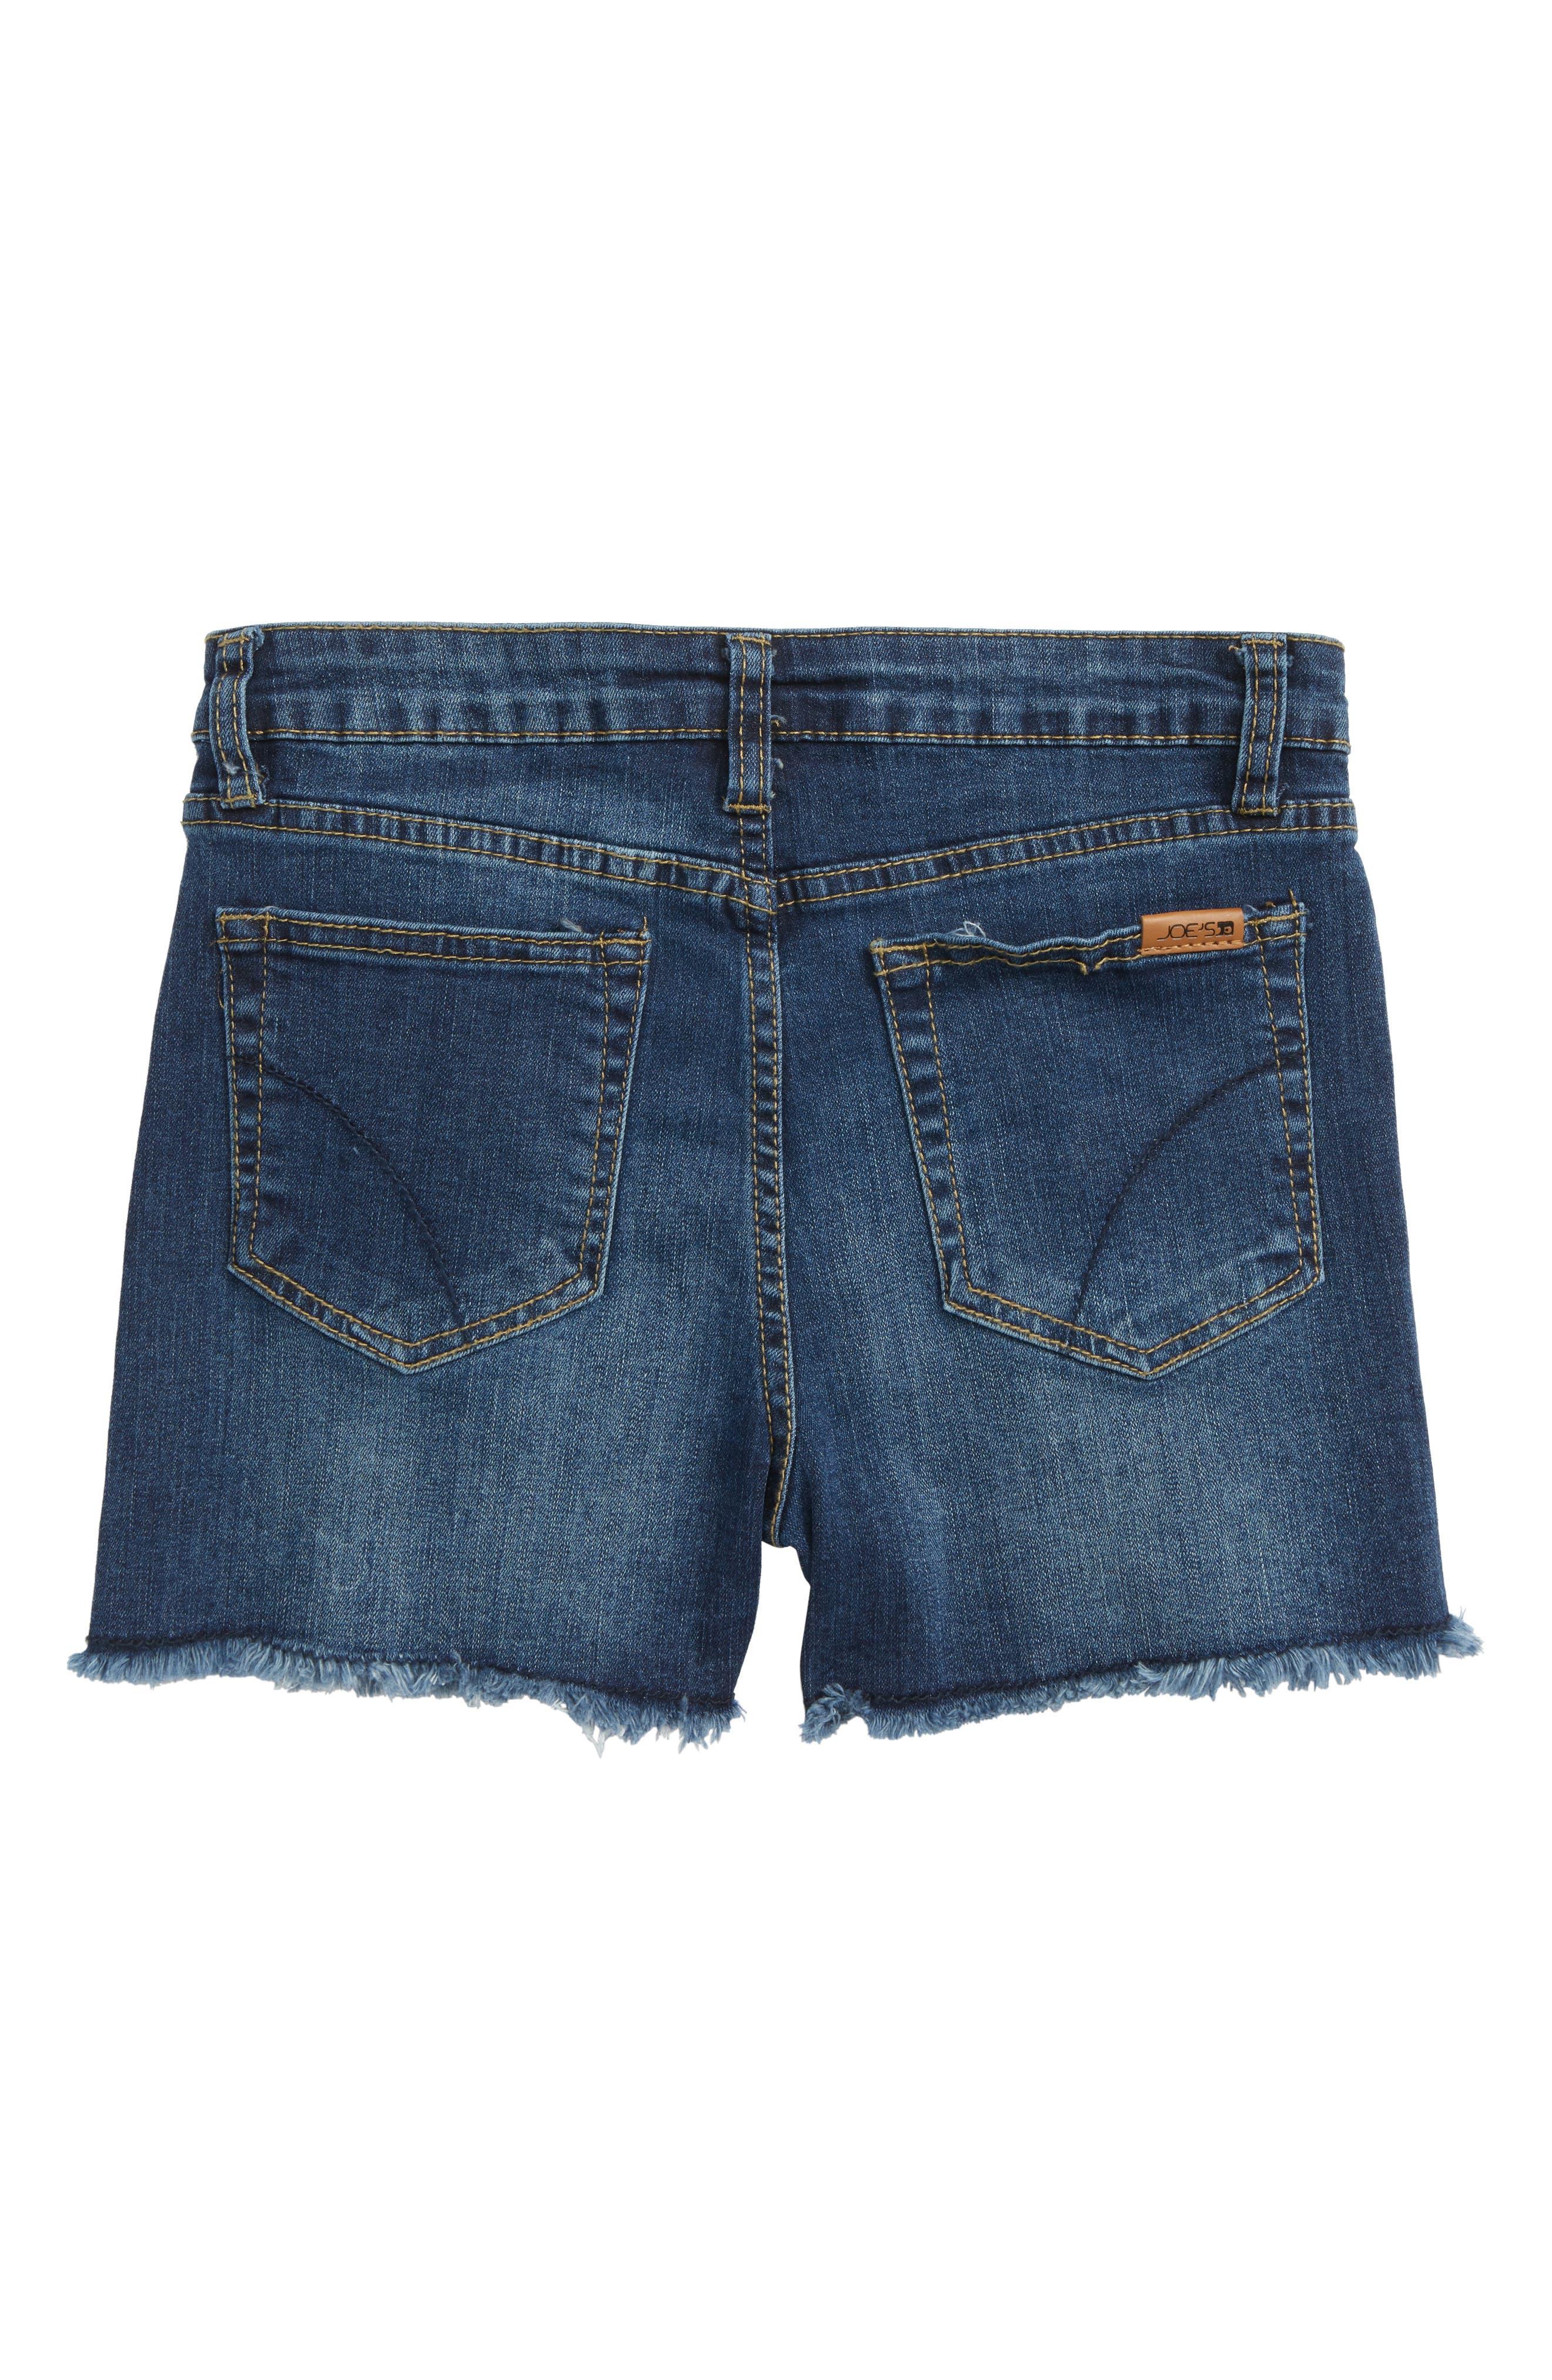 Charlie High Waist Cutoff Shorts,                             Alternate thumbnail 2, color,                             401